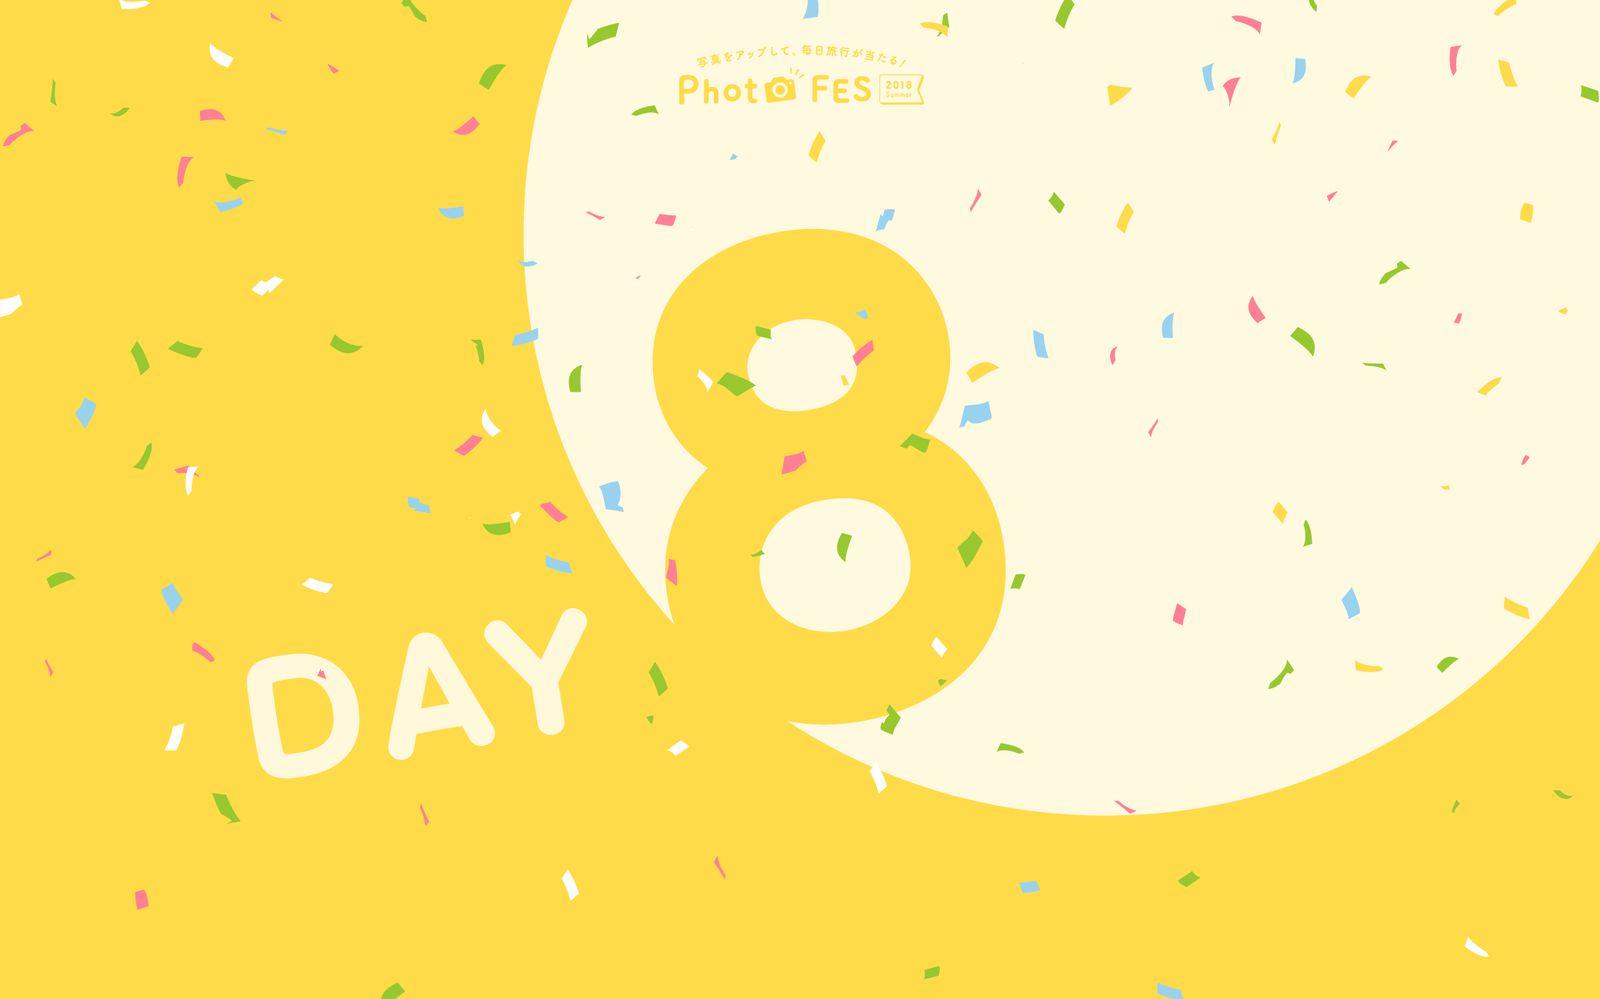 【DAY8】「Photo FES 2018」7月3日投稿分であたる賞品&受賞者発表